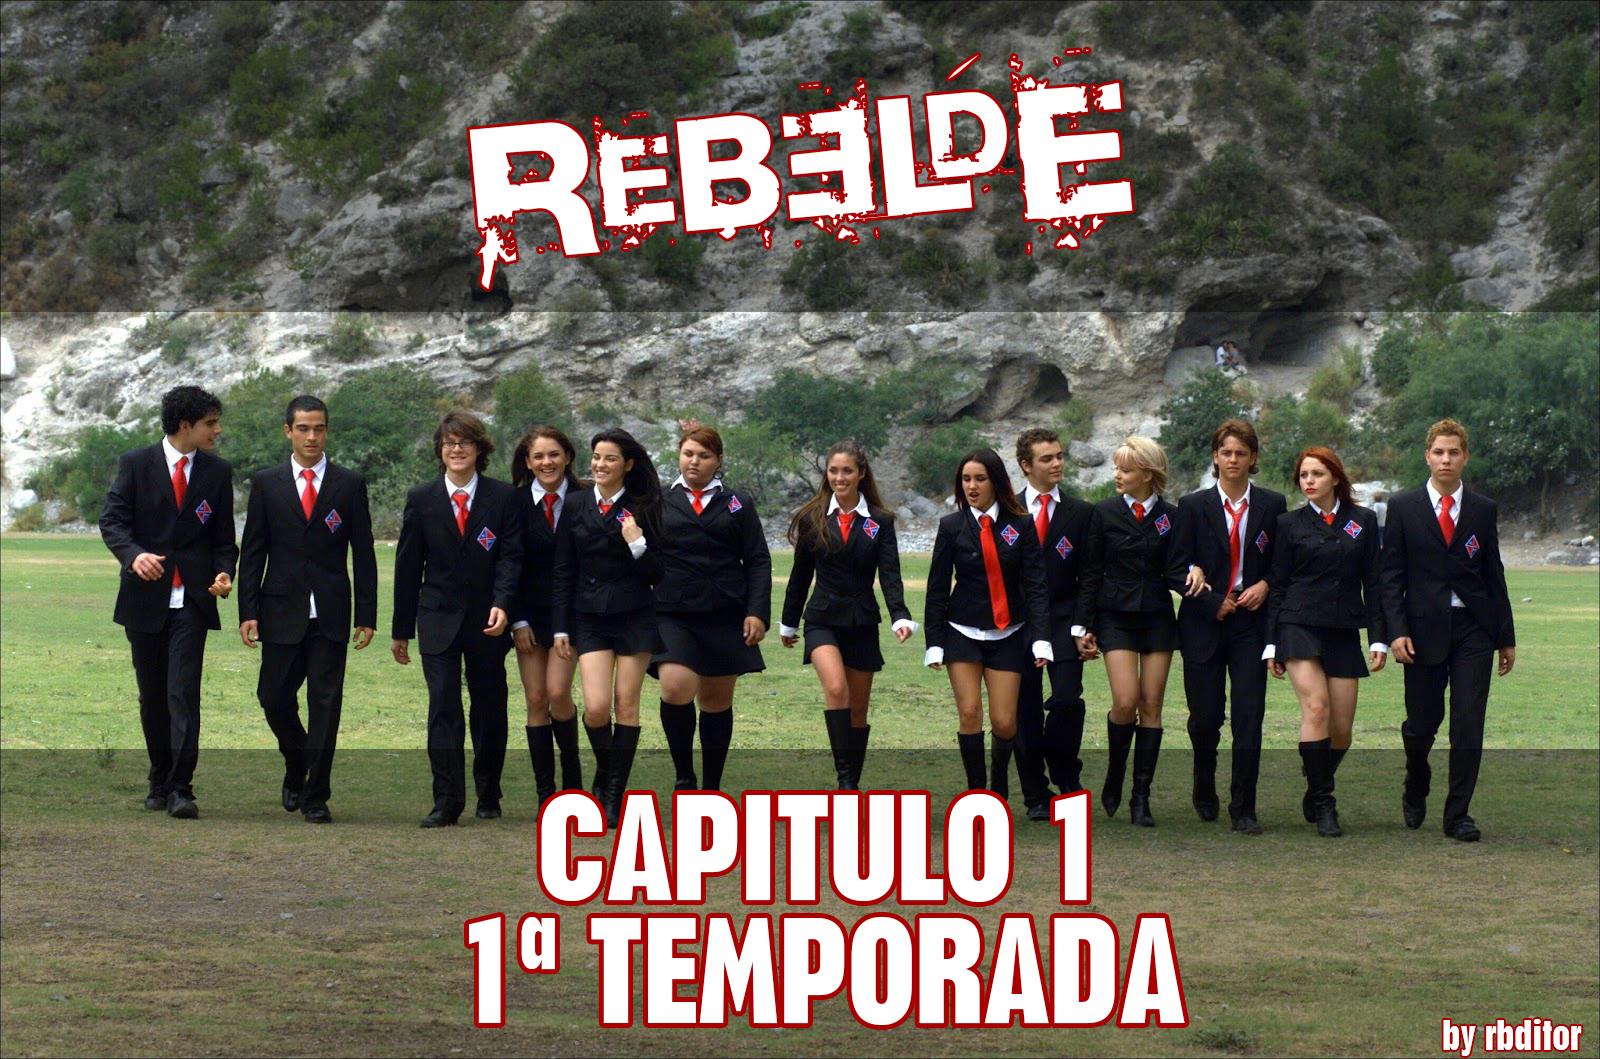 Rebelde - Capítulo 1 - 1ª Temporada - Rebelde - Telenovela